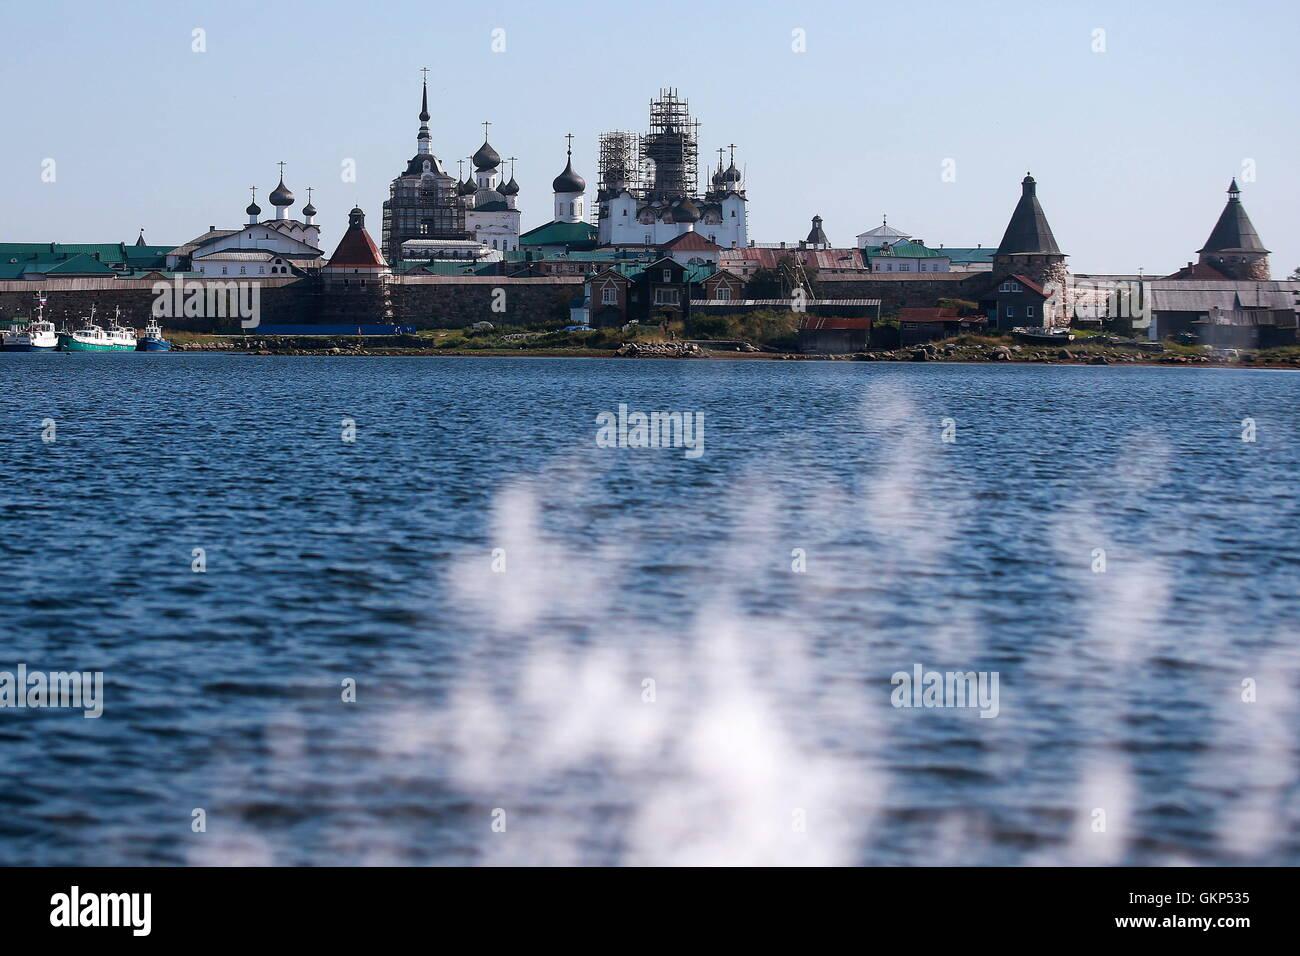 Arkhangelsk Region, Russia. 20th Aug, 2016. The Solovetsky Monastery on the Solovetsky Archipelago. © Sergei Fadeichev/TASS/Alamy Stock Photo